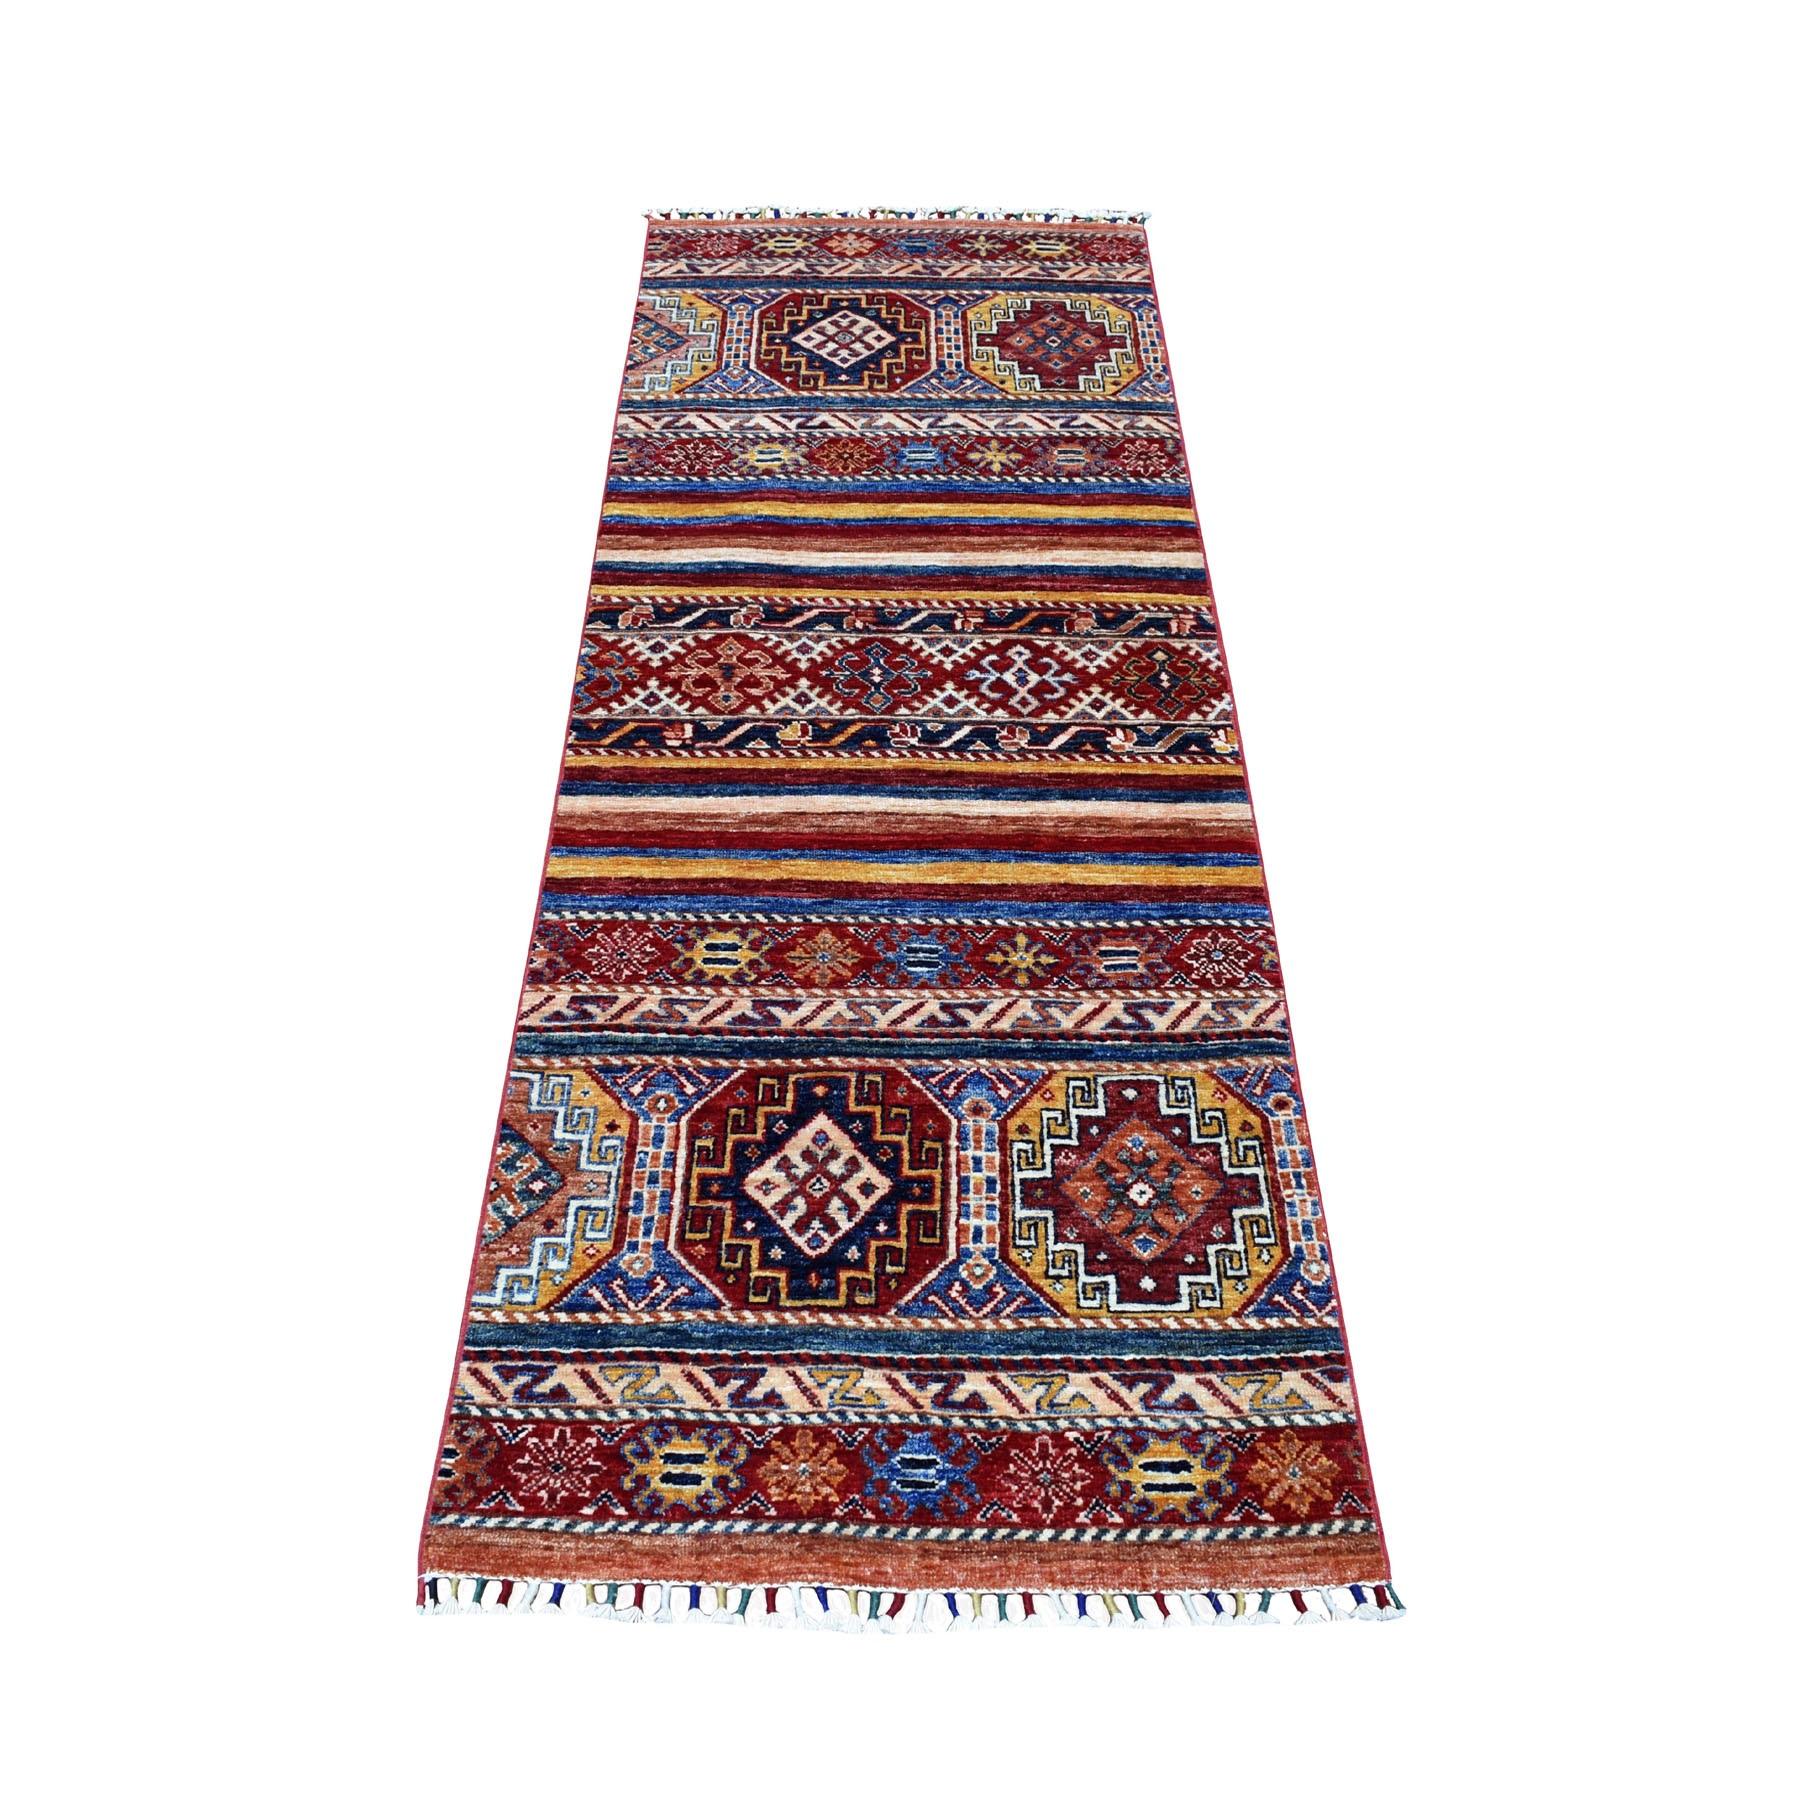 "2'5""X6'7"" Red Khorjin Design Runner Super Kazak Geometric Hand Knotted Pure Wool Oriental Rug moaeb88a"